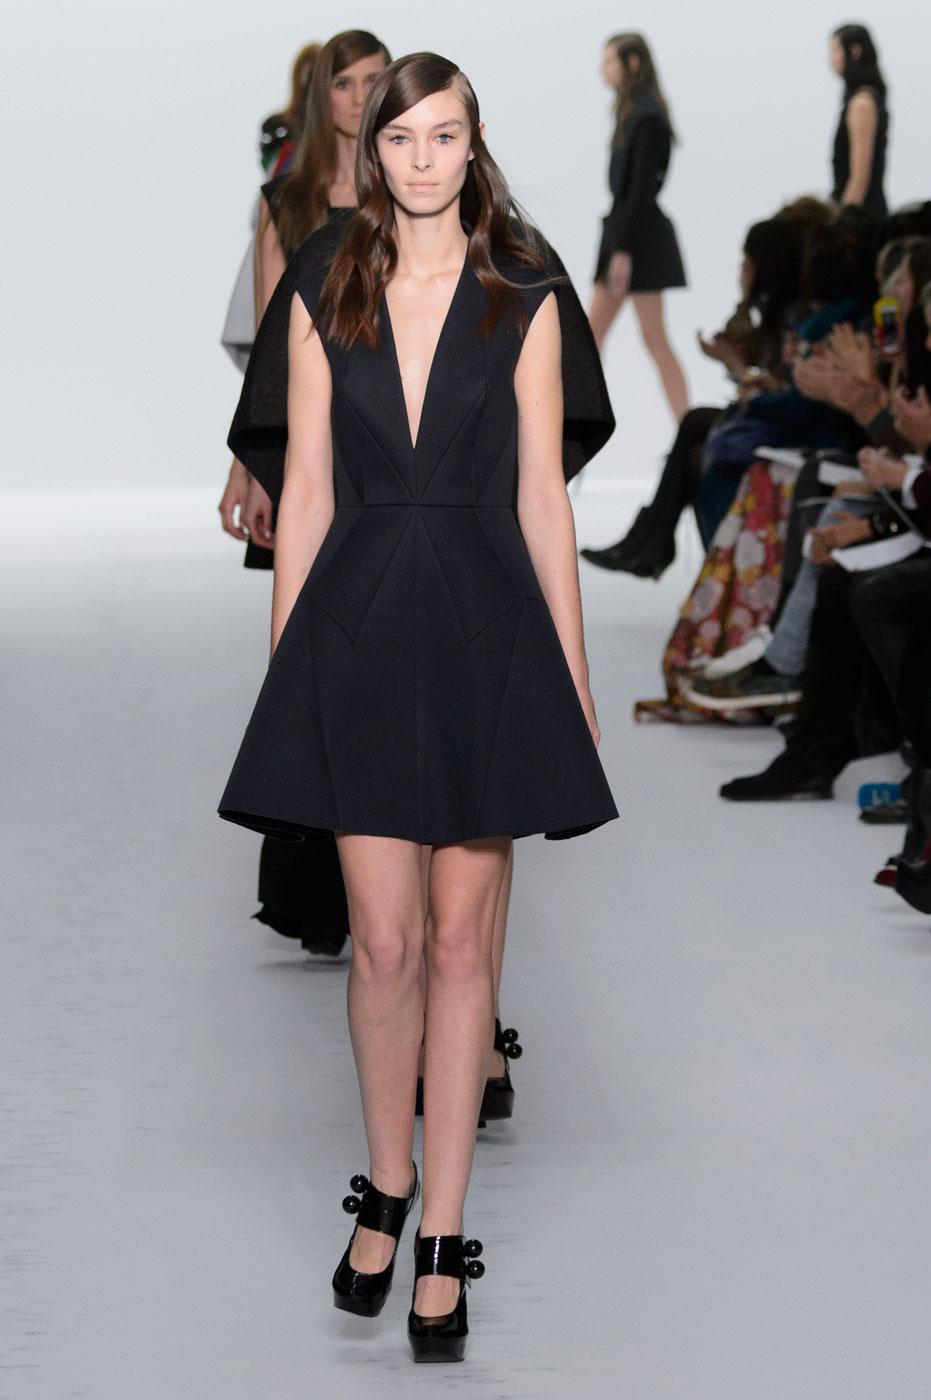 Kayek-fashion-runway-show-haute-couture-paris-spring-summer-2015-the-impression-47